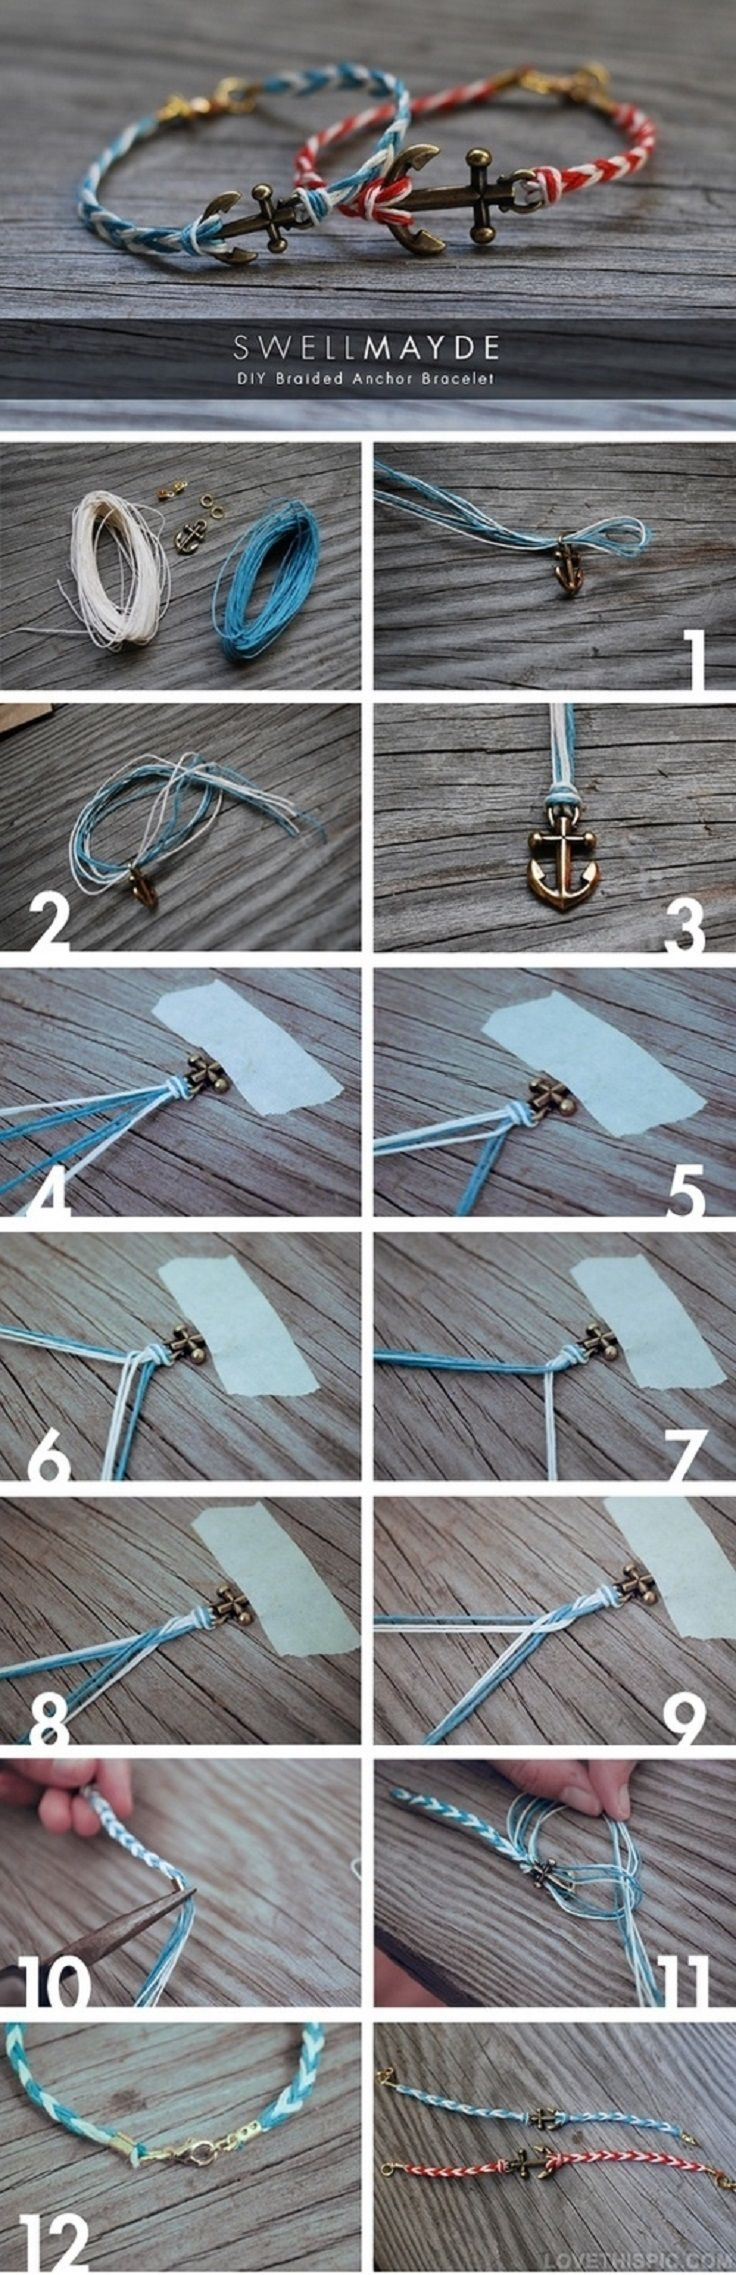 22228-Diy-Braided-Anchor-Bracelet.jpg 736×2,275ピクセル